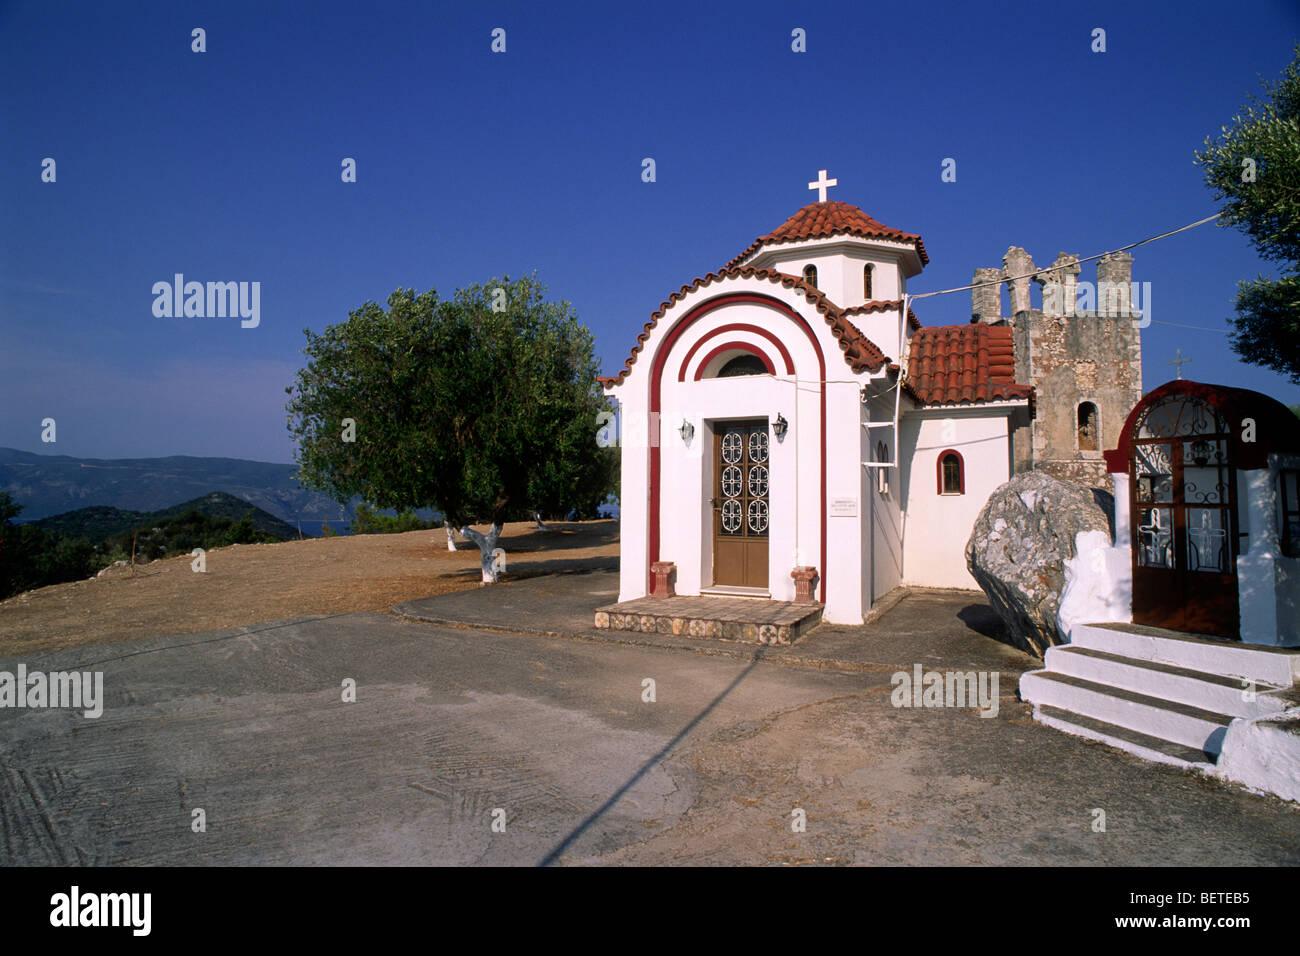 Grecia Isole Ionie, Cefalonia, monastero di theotokou agrilion vicino sami Immagini Stock